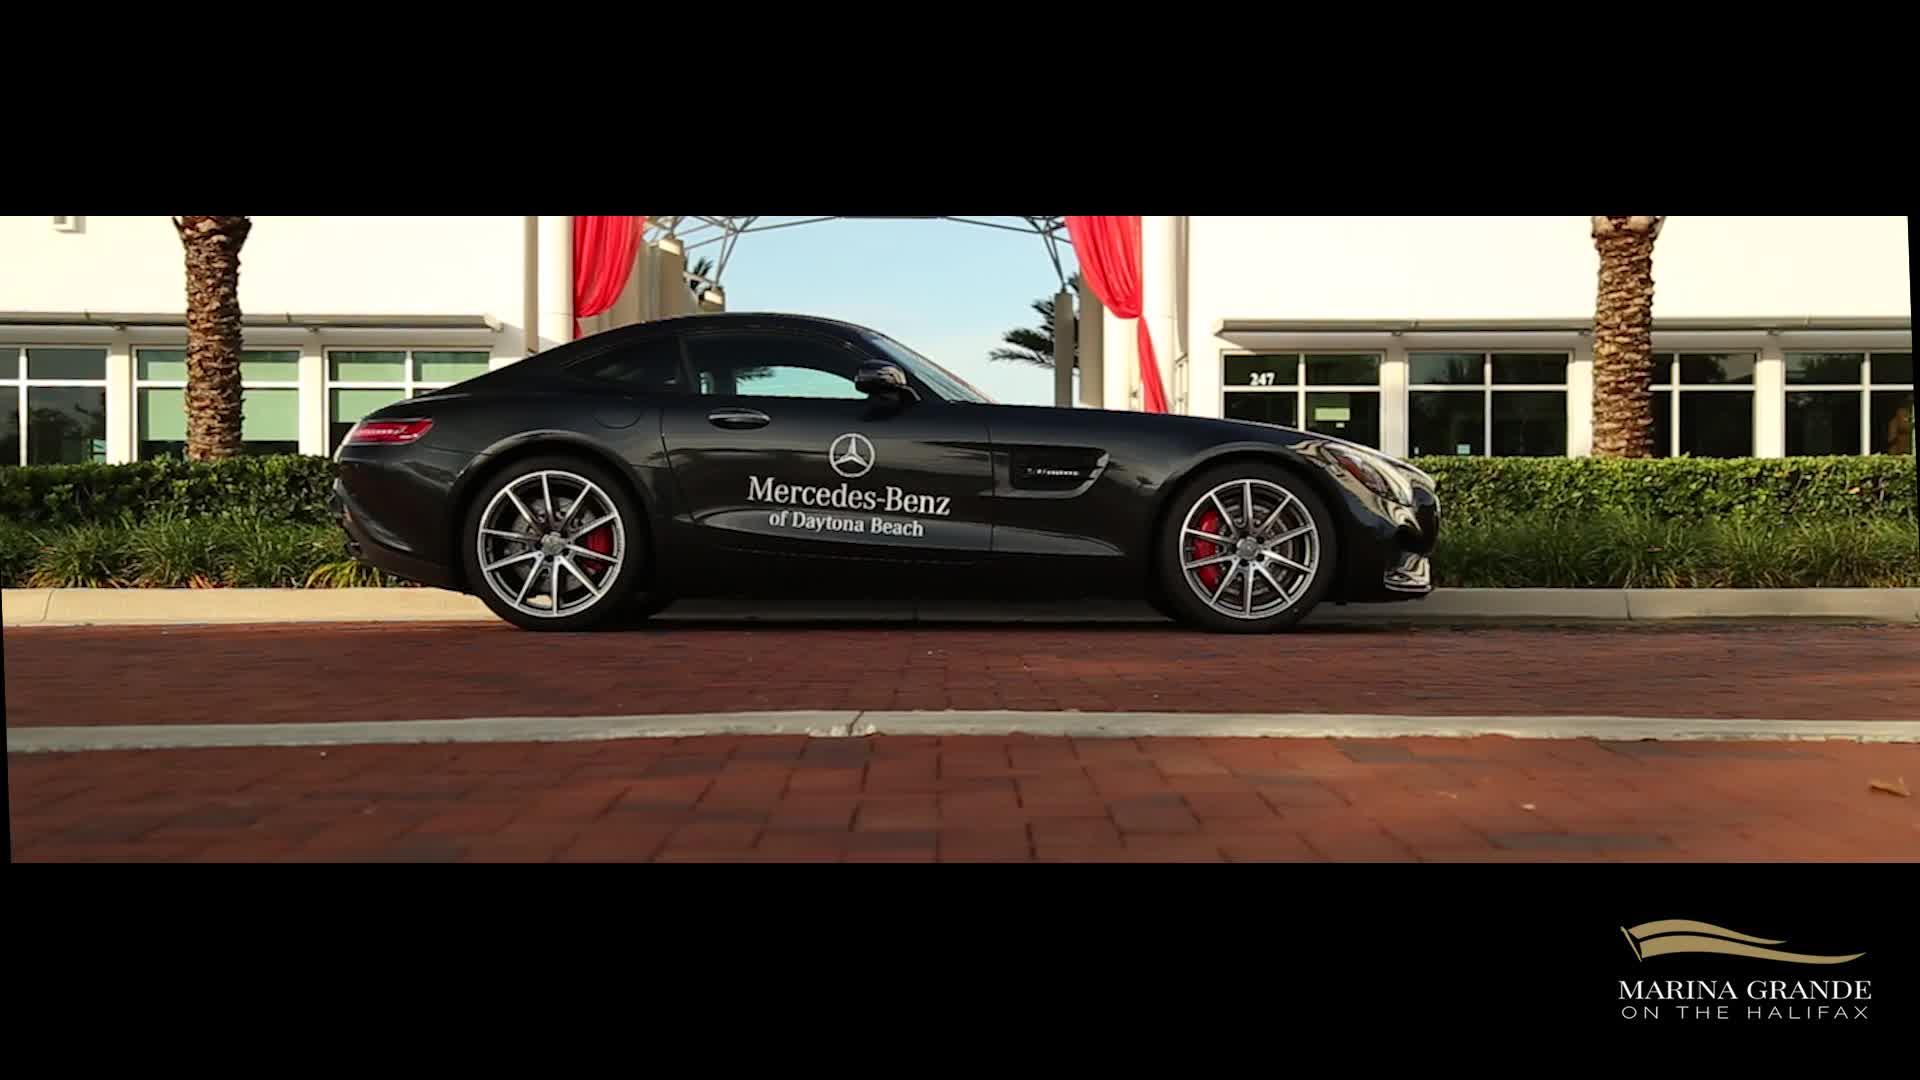 Casino Royal Marina Grande Daytona Beach Video Watch at Y8